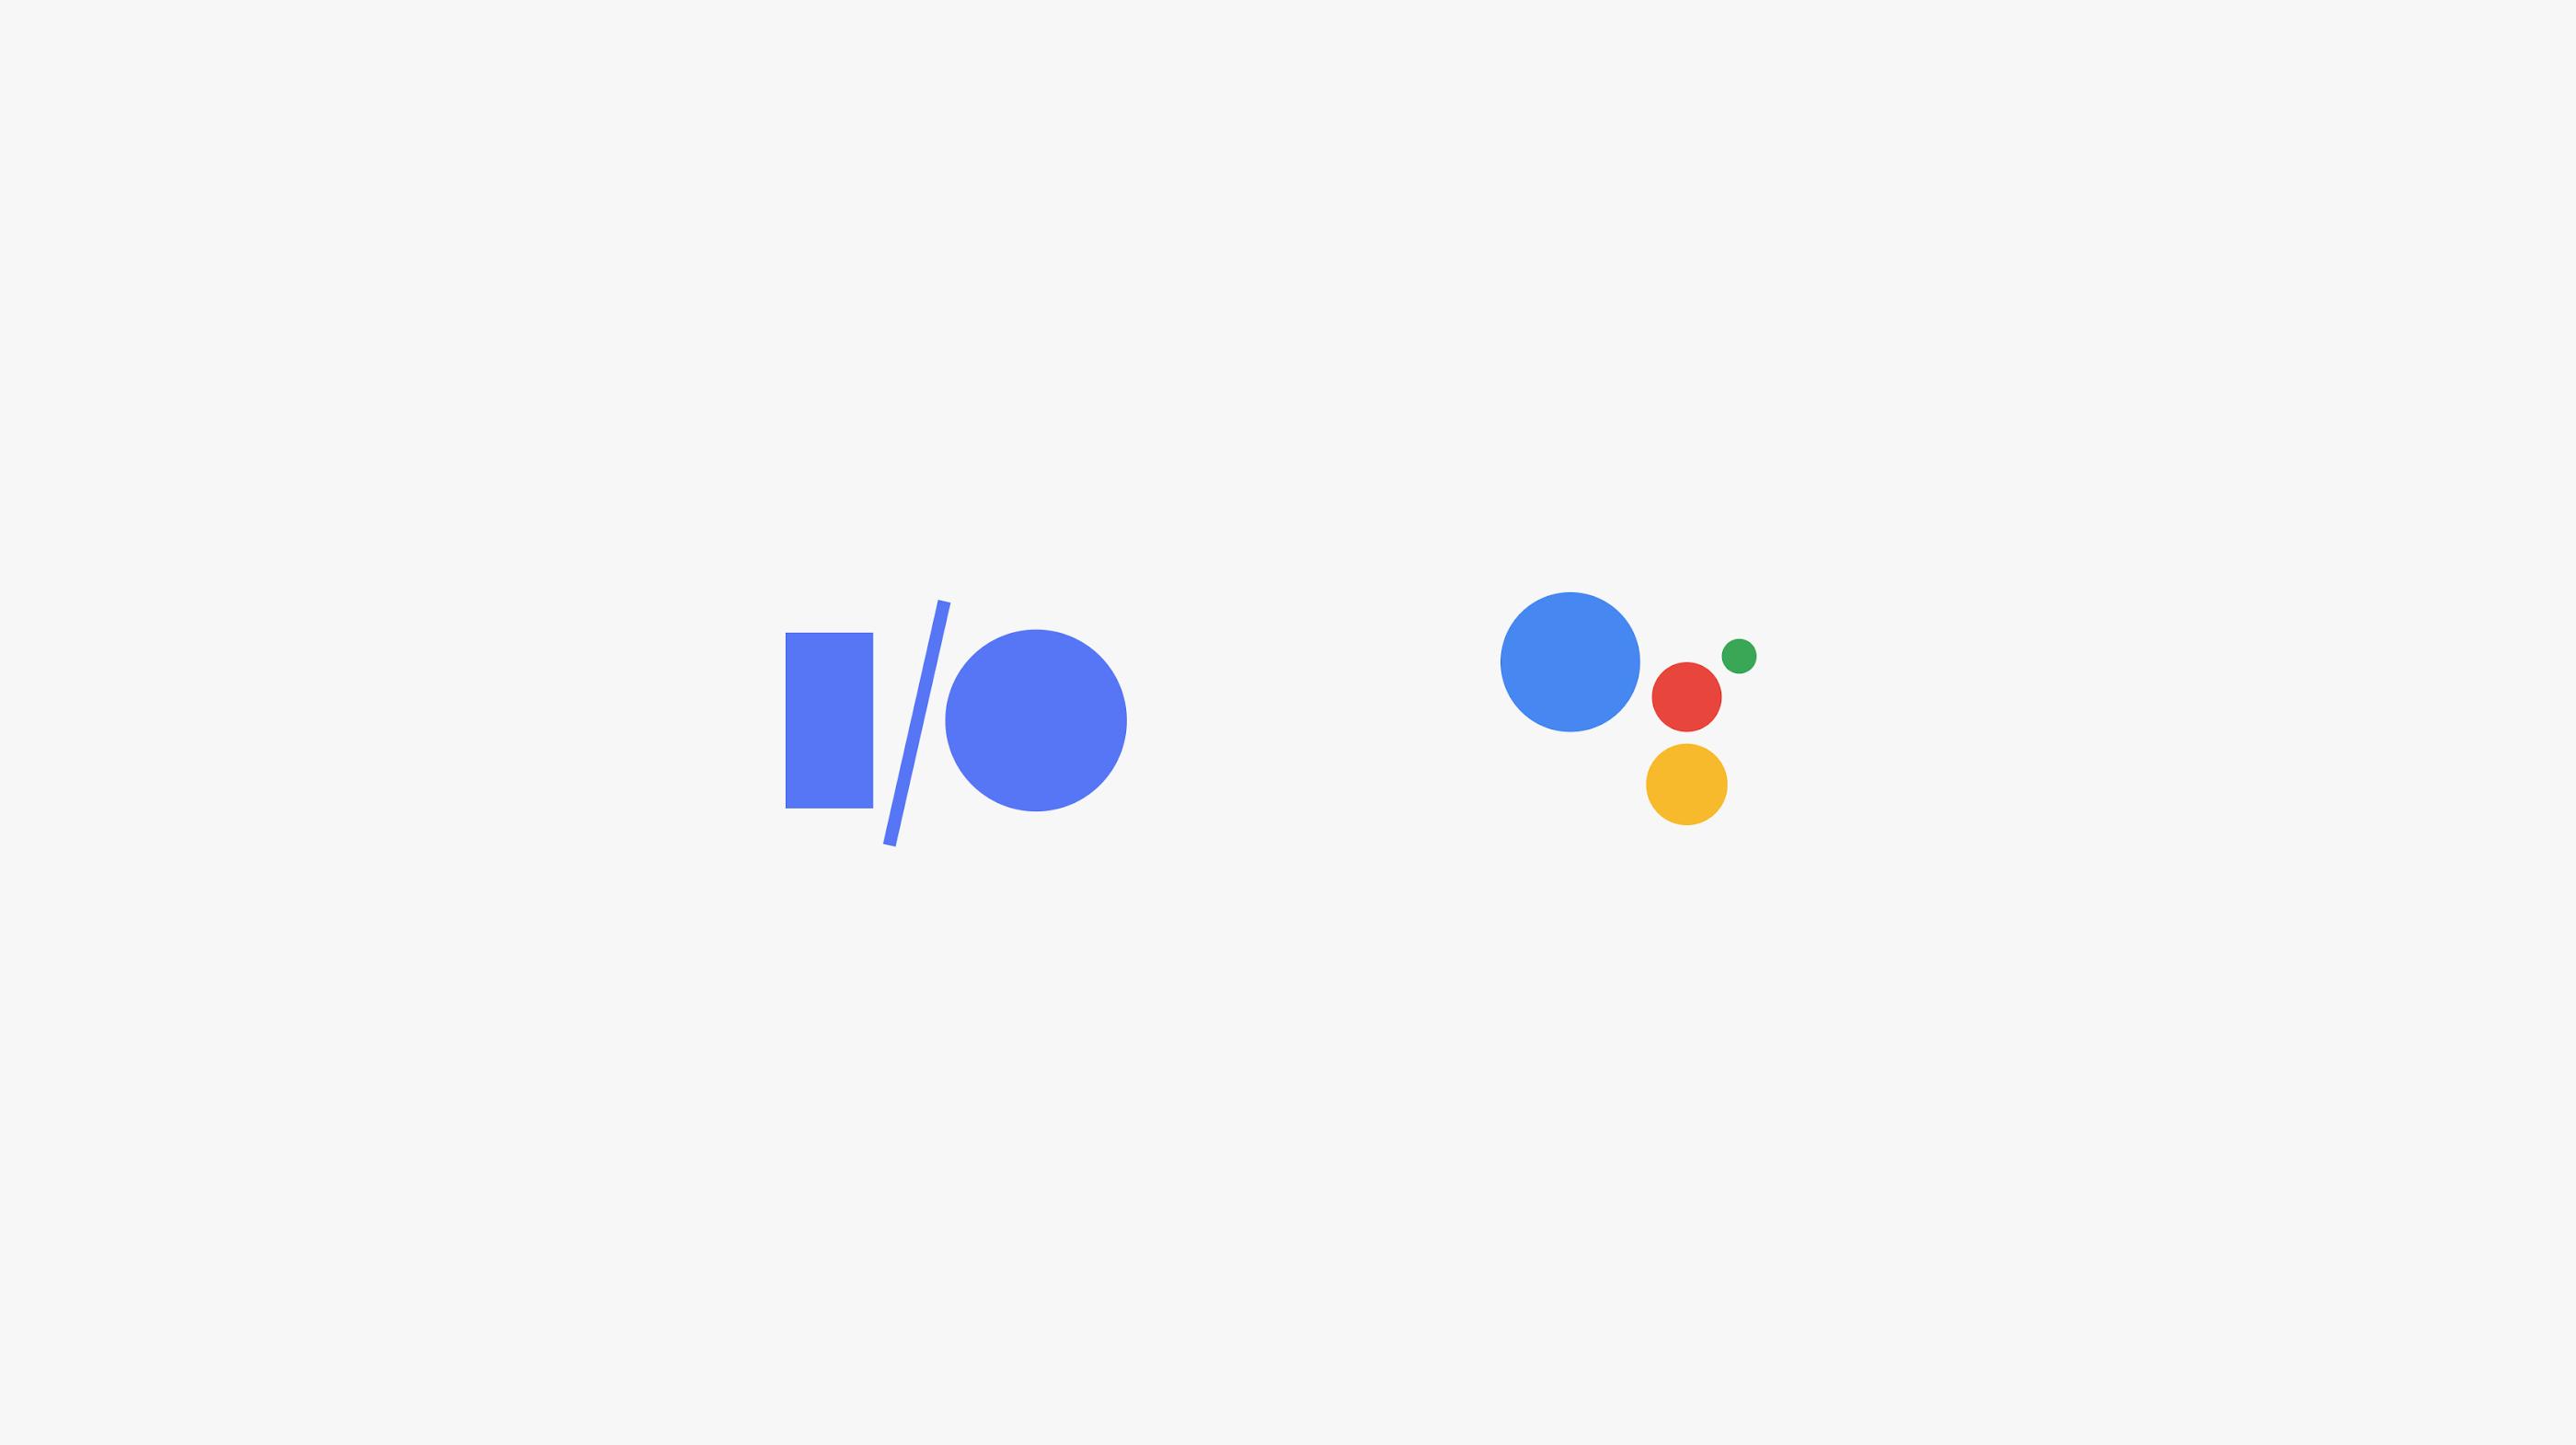 google assistant novità I/O 2018